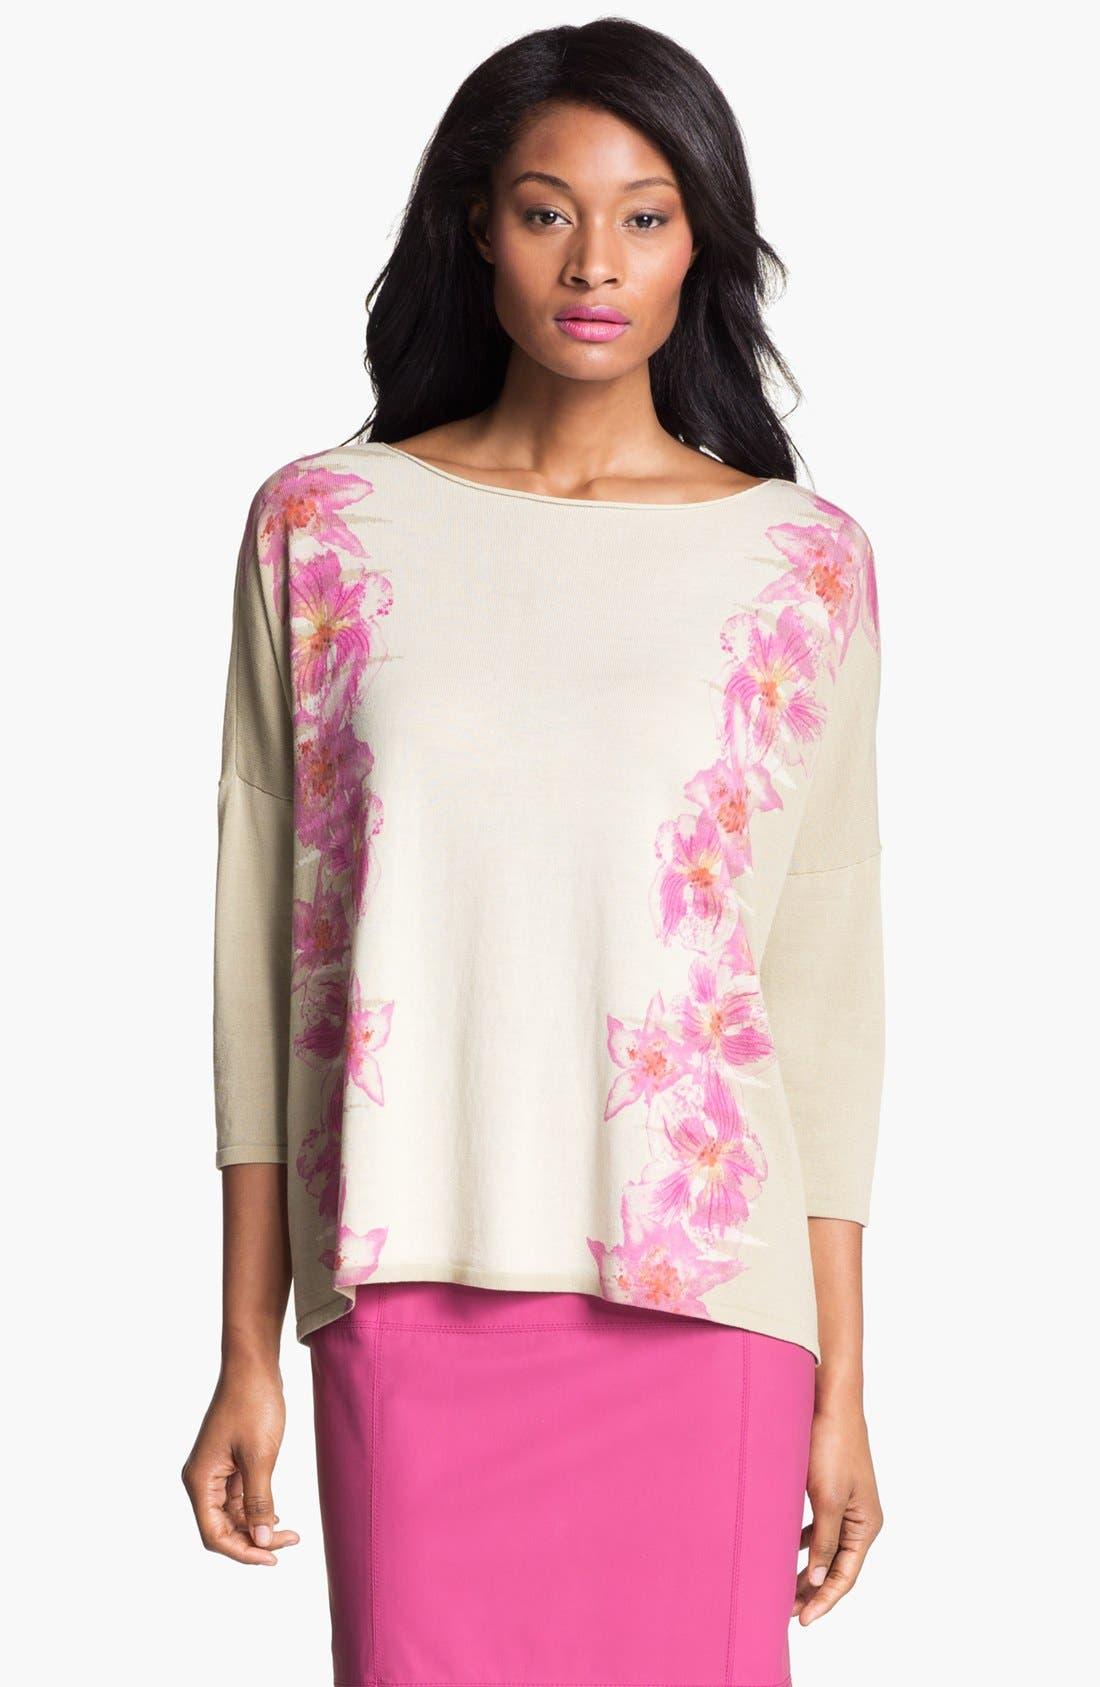 Main Image - Lafayette 148 New York 'Opulent' Intarsia Sweater